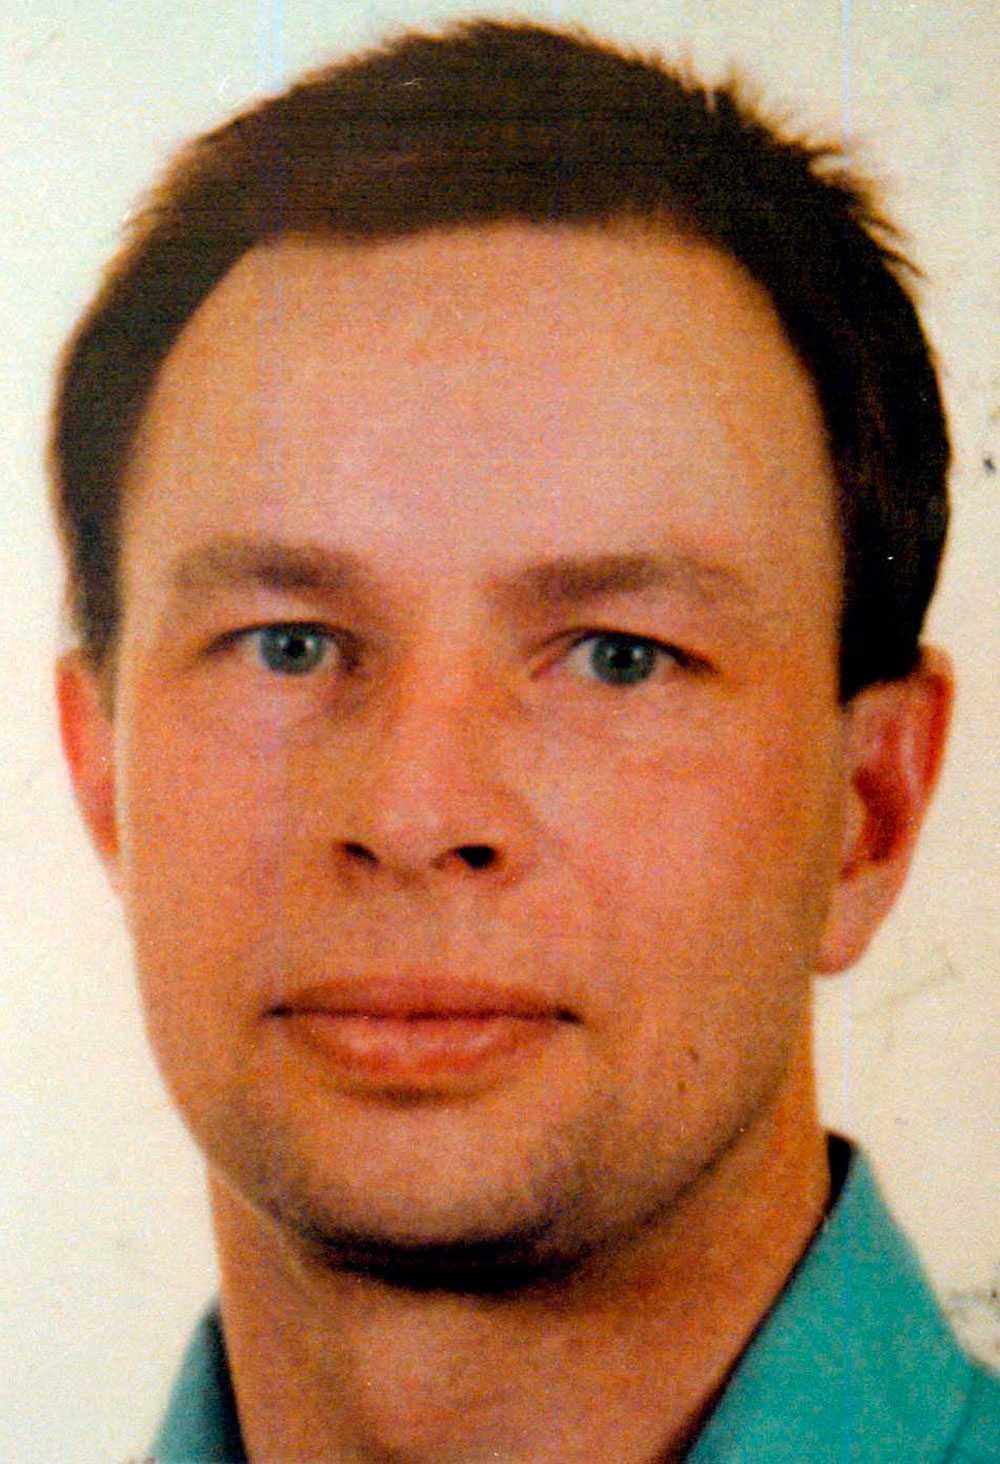 Polismannen Olov Borén mördades under rånarjakten i Malexander.